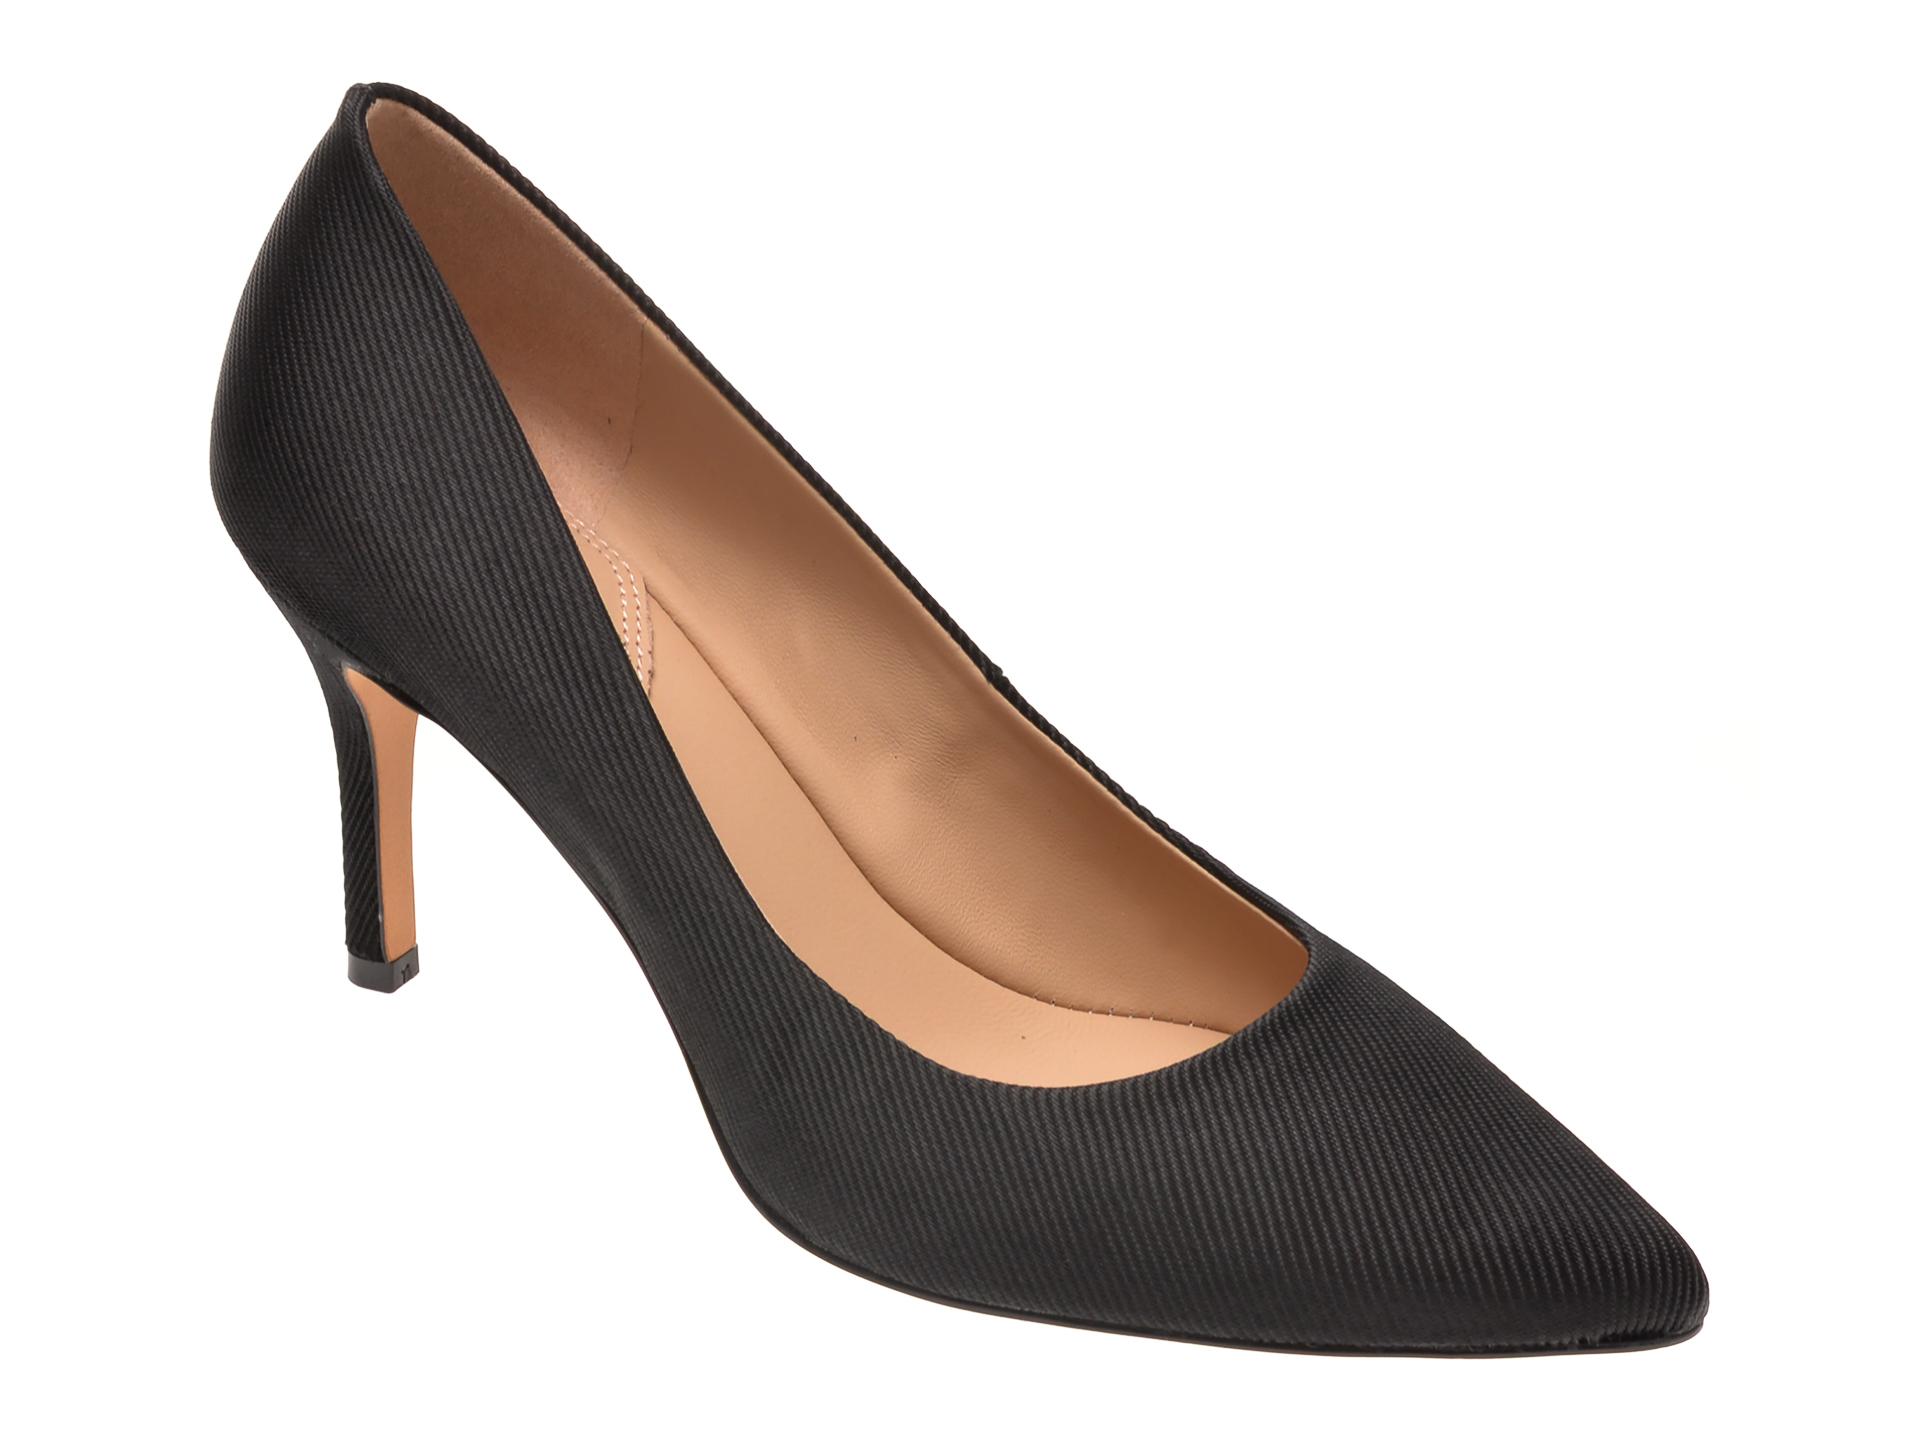 Pantofi ALDO negri, Coronitiflex001, din material textil